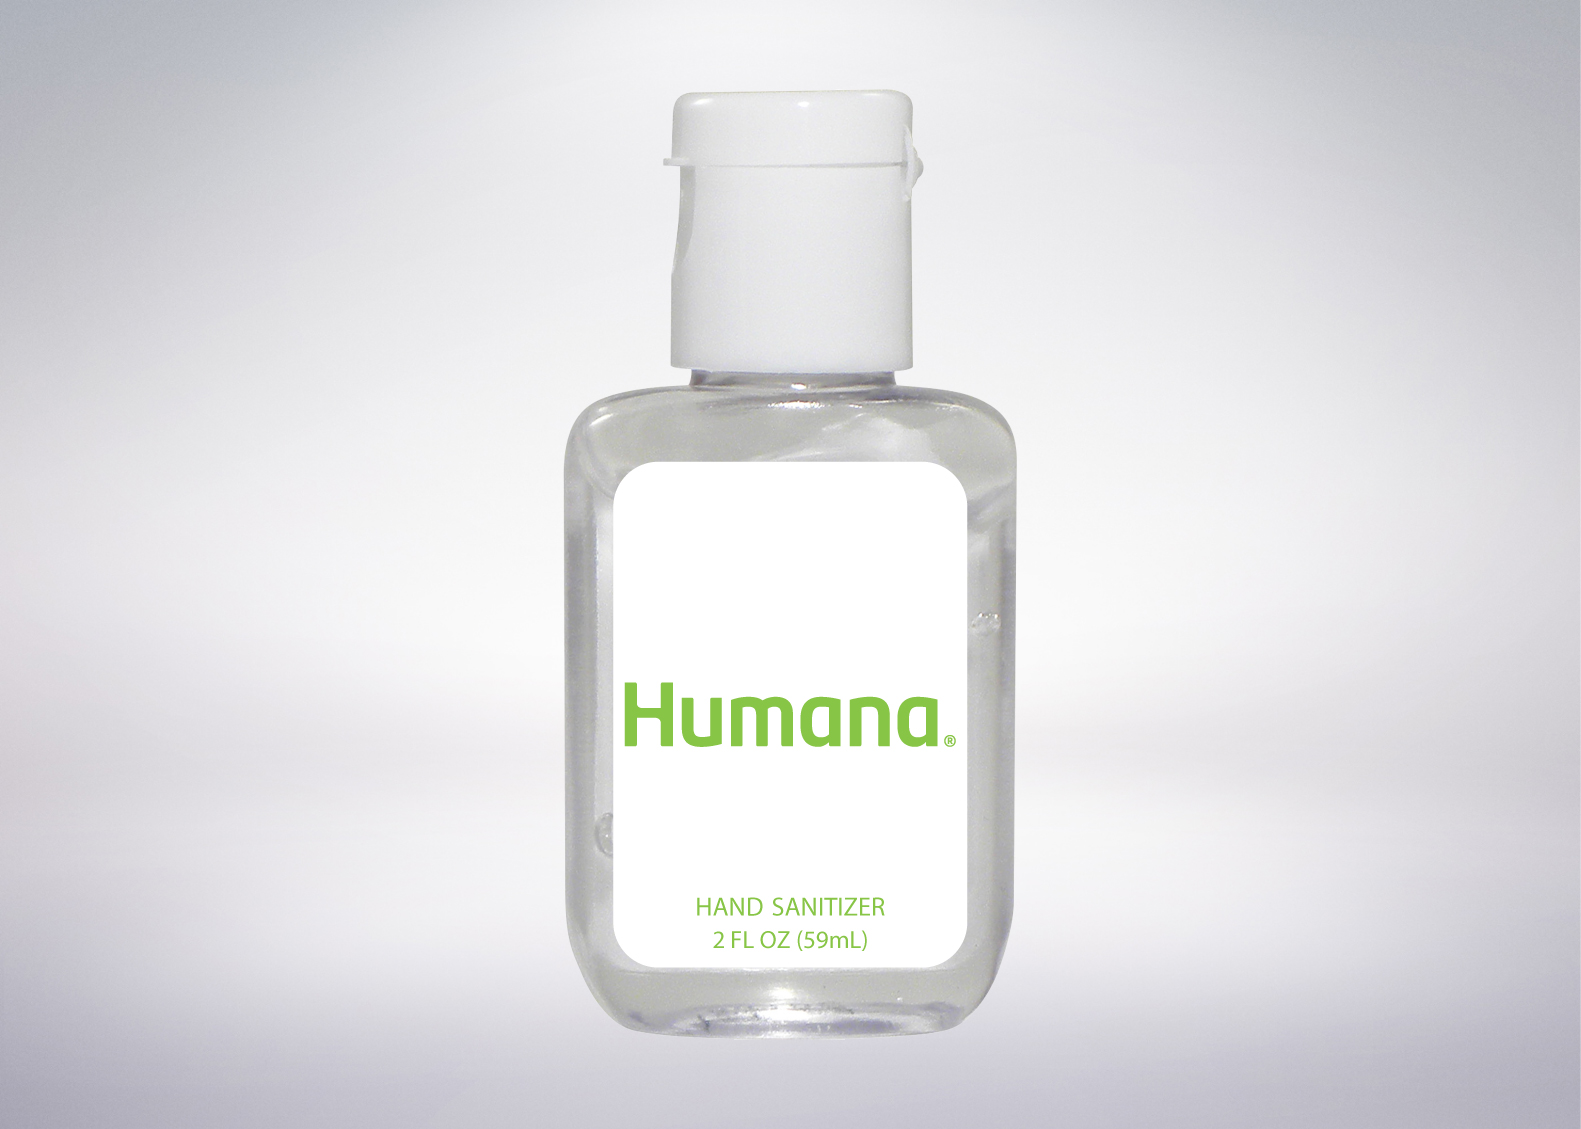 Humana Hand Sanitizer